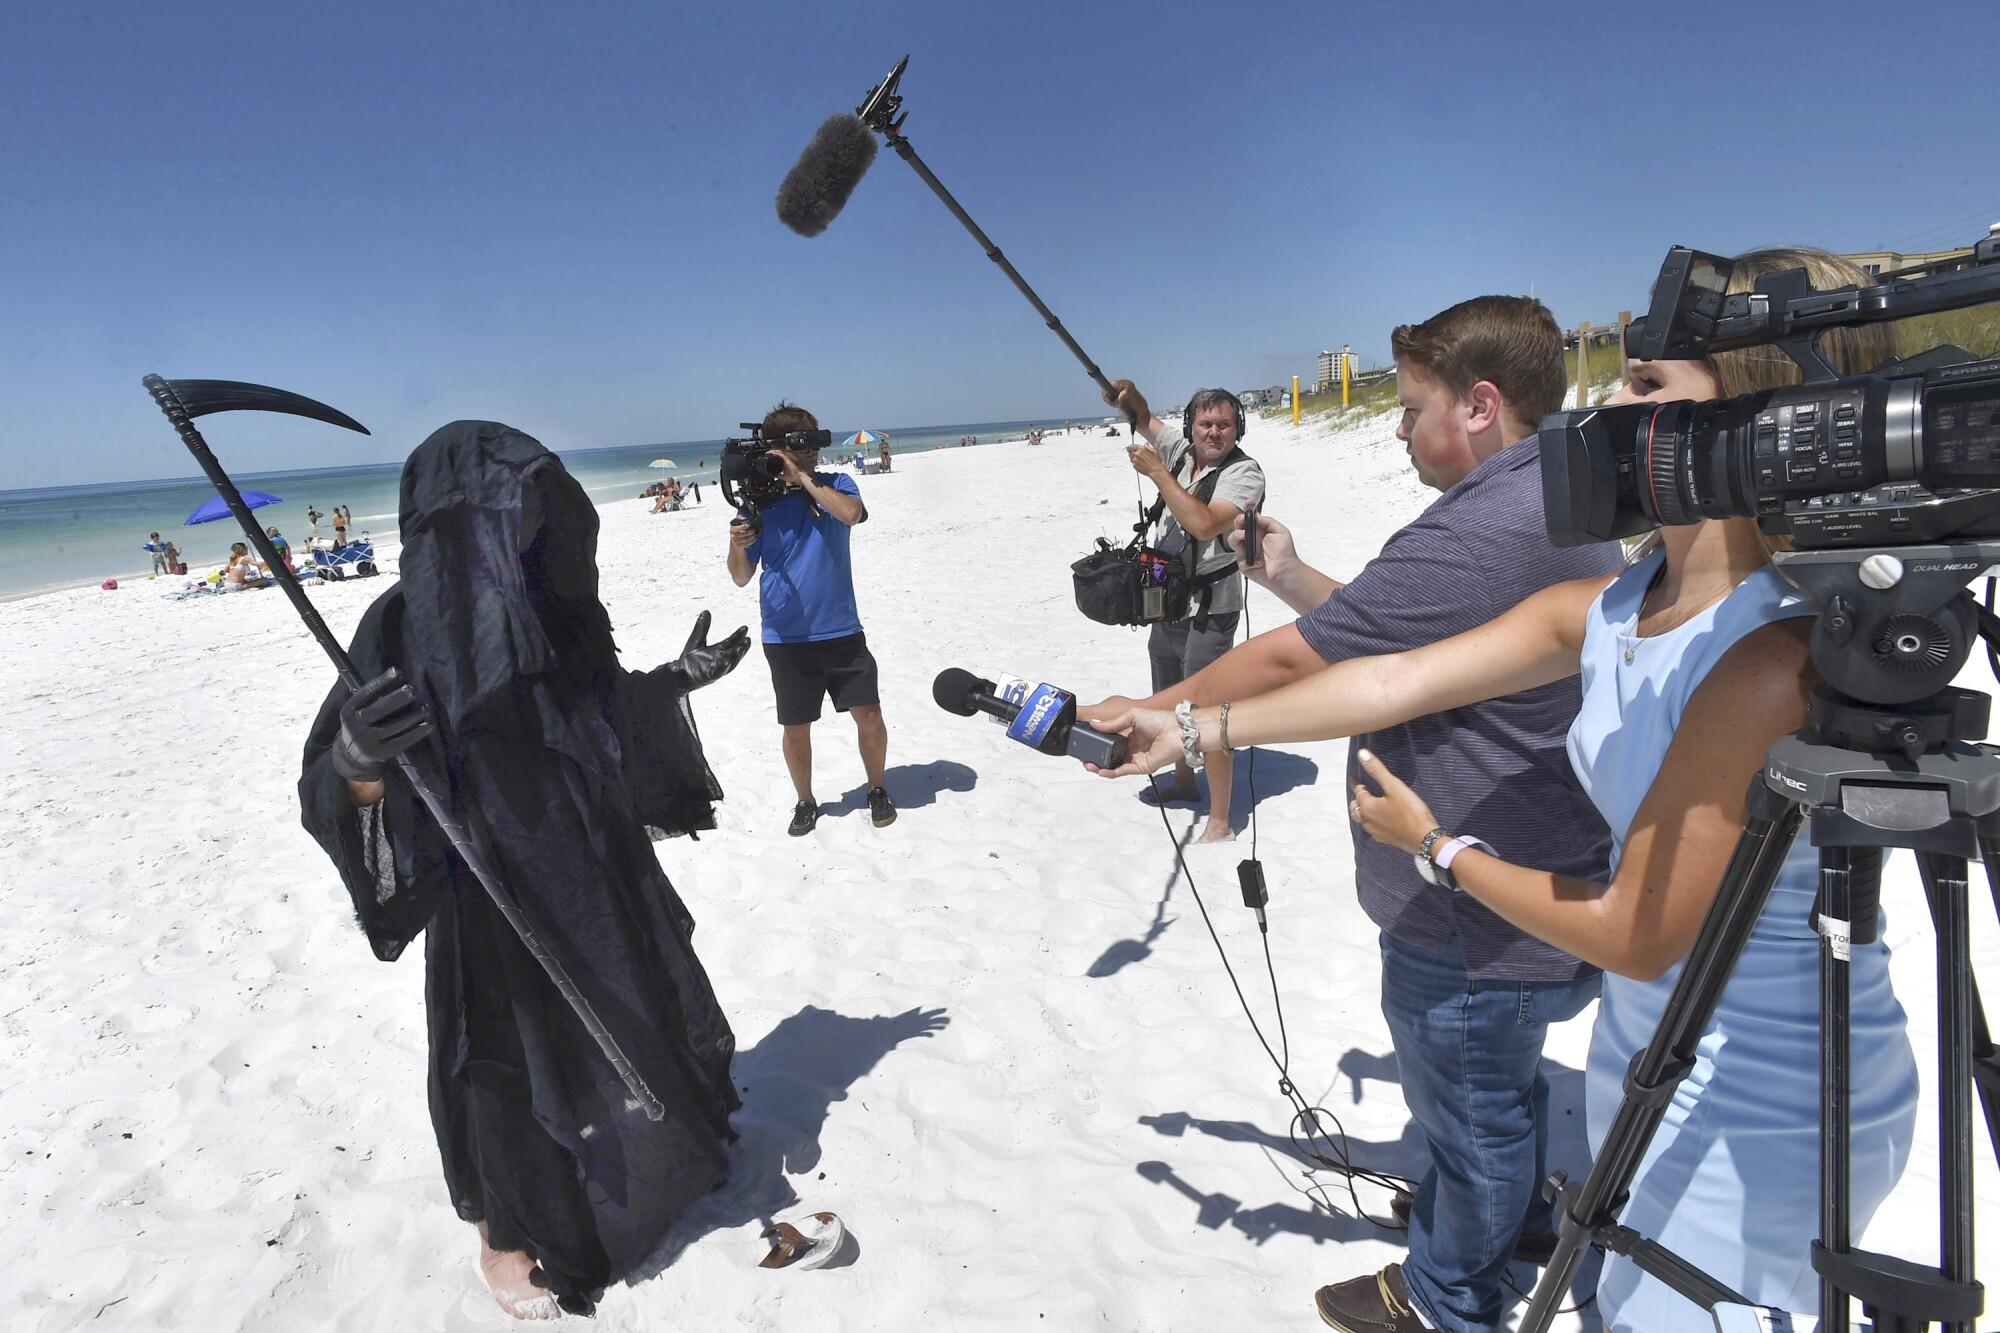 Florida attorney Daniel Uhlfelder, dressed as the Grim Reaper, talks with reporters at a beach near Destin, Fla., on May 1.